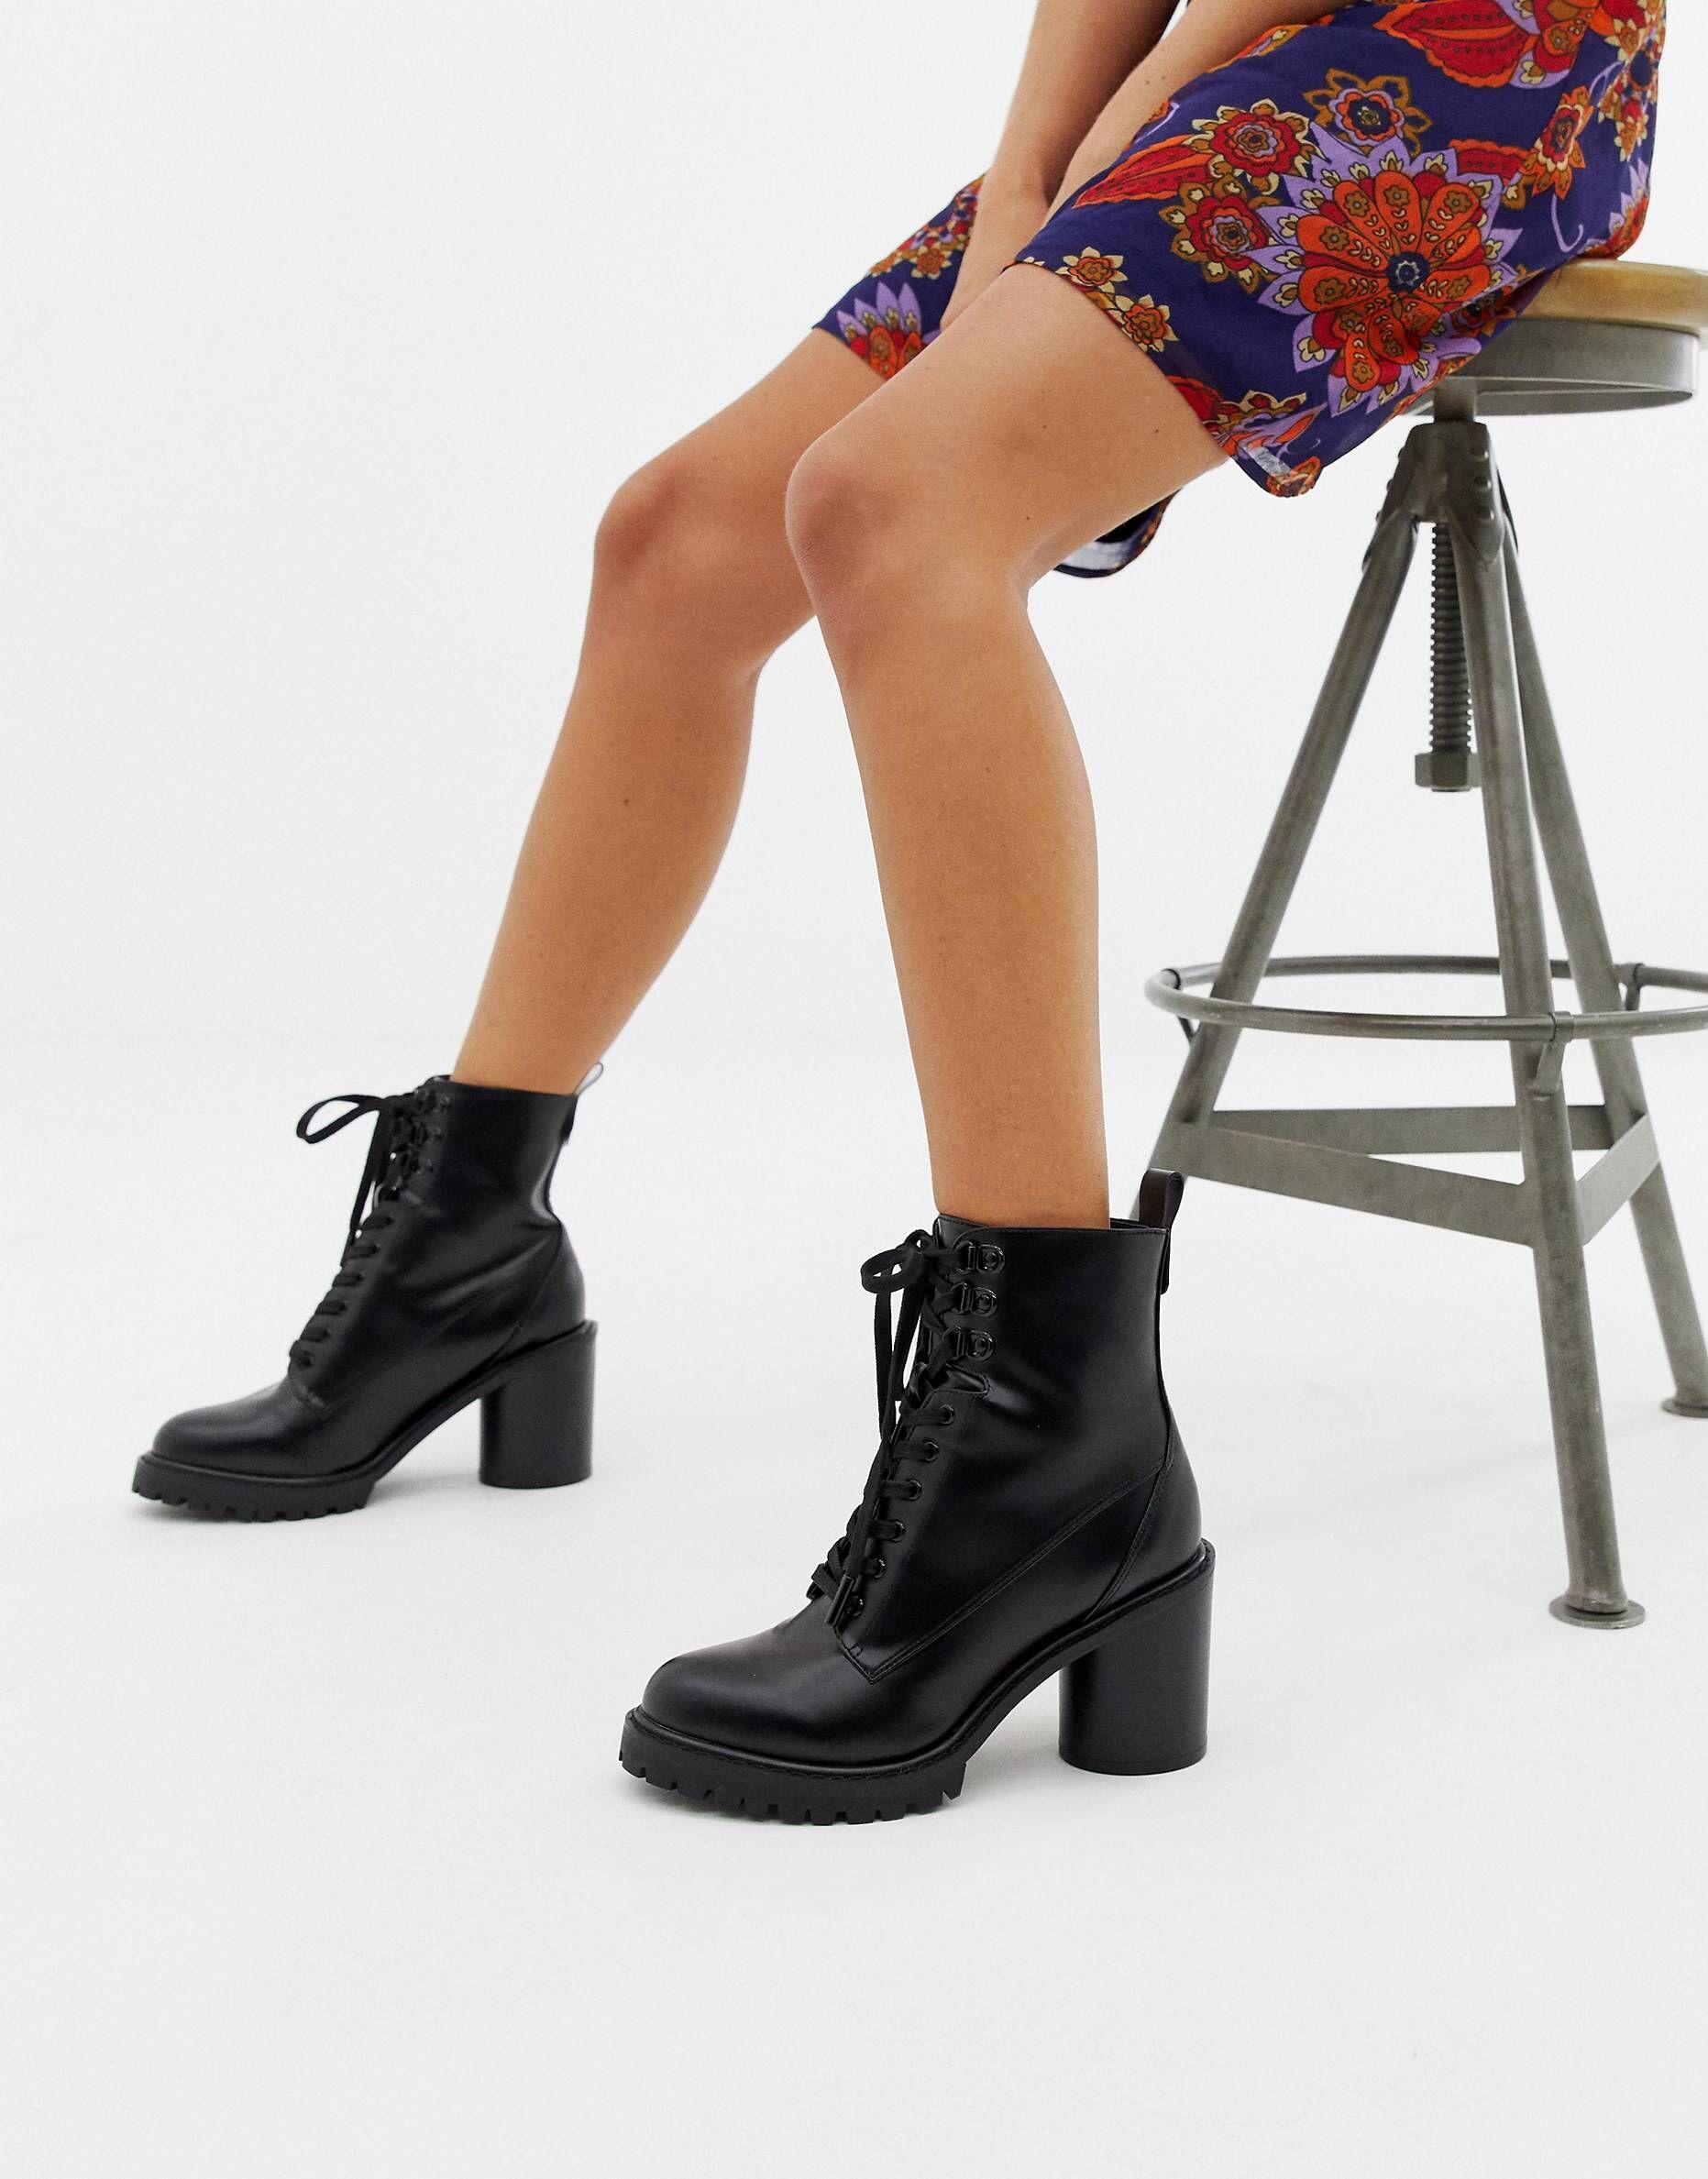 cf3e7de5c89 Faith Barc heeled hiker boots in black | f o o t w e a r | Boots ...